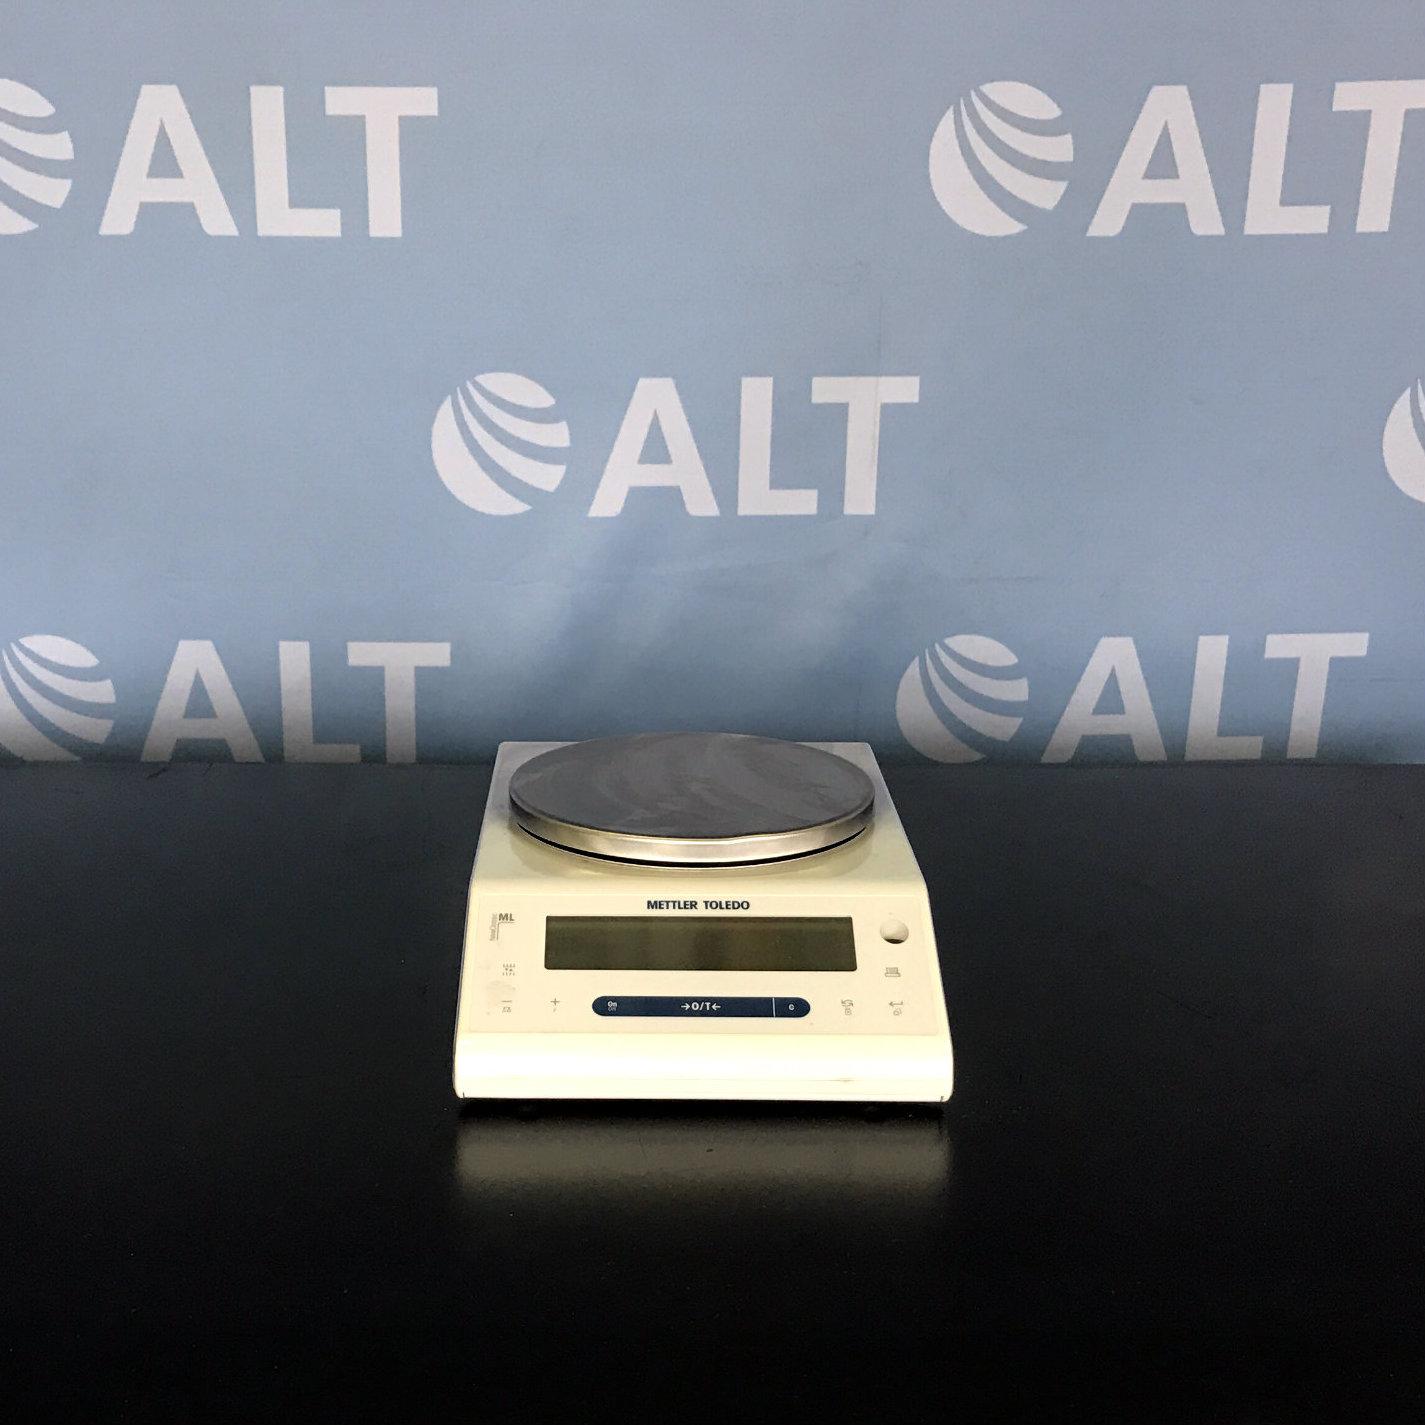 Mettler Toledo  NewClassic SG  ML3001E Balances, 3200g Capacity Image